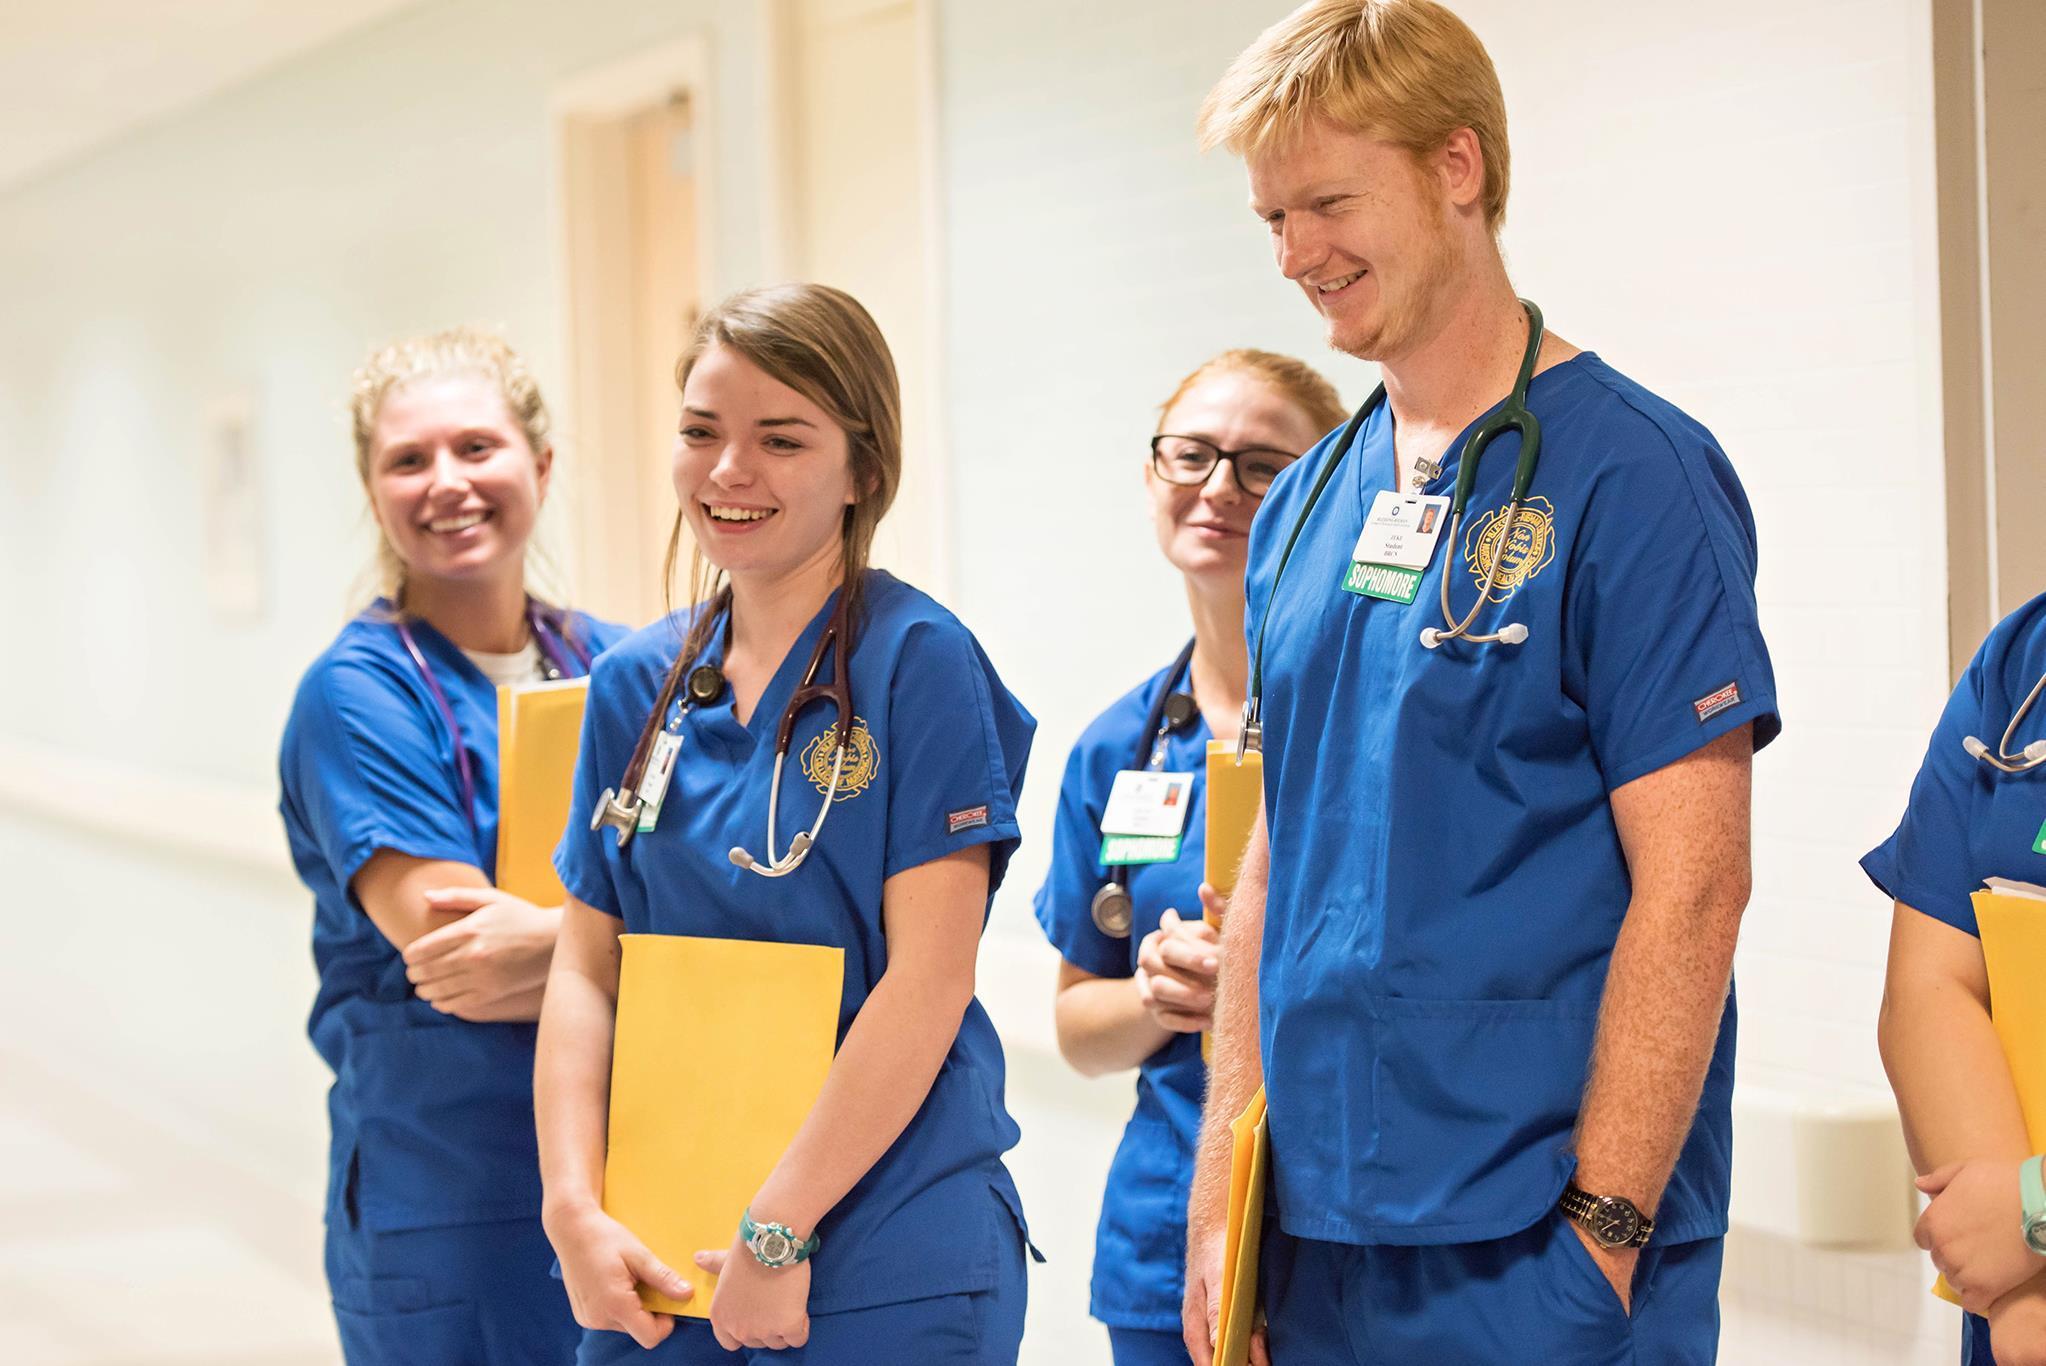 Blessing-Rieman College of Nursing & Health Sciences image 1